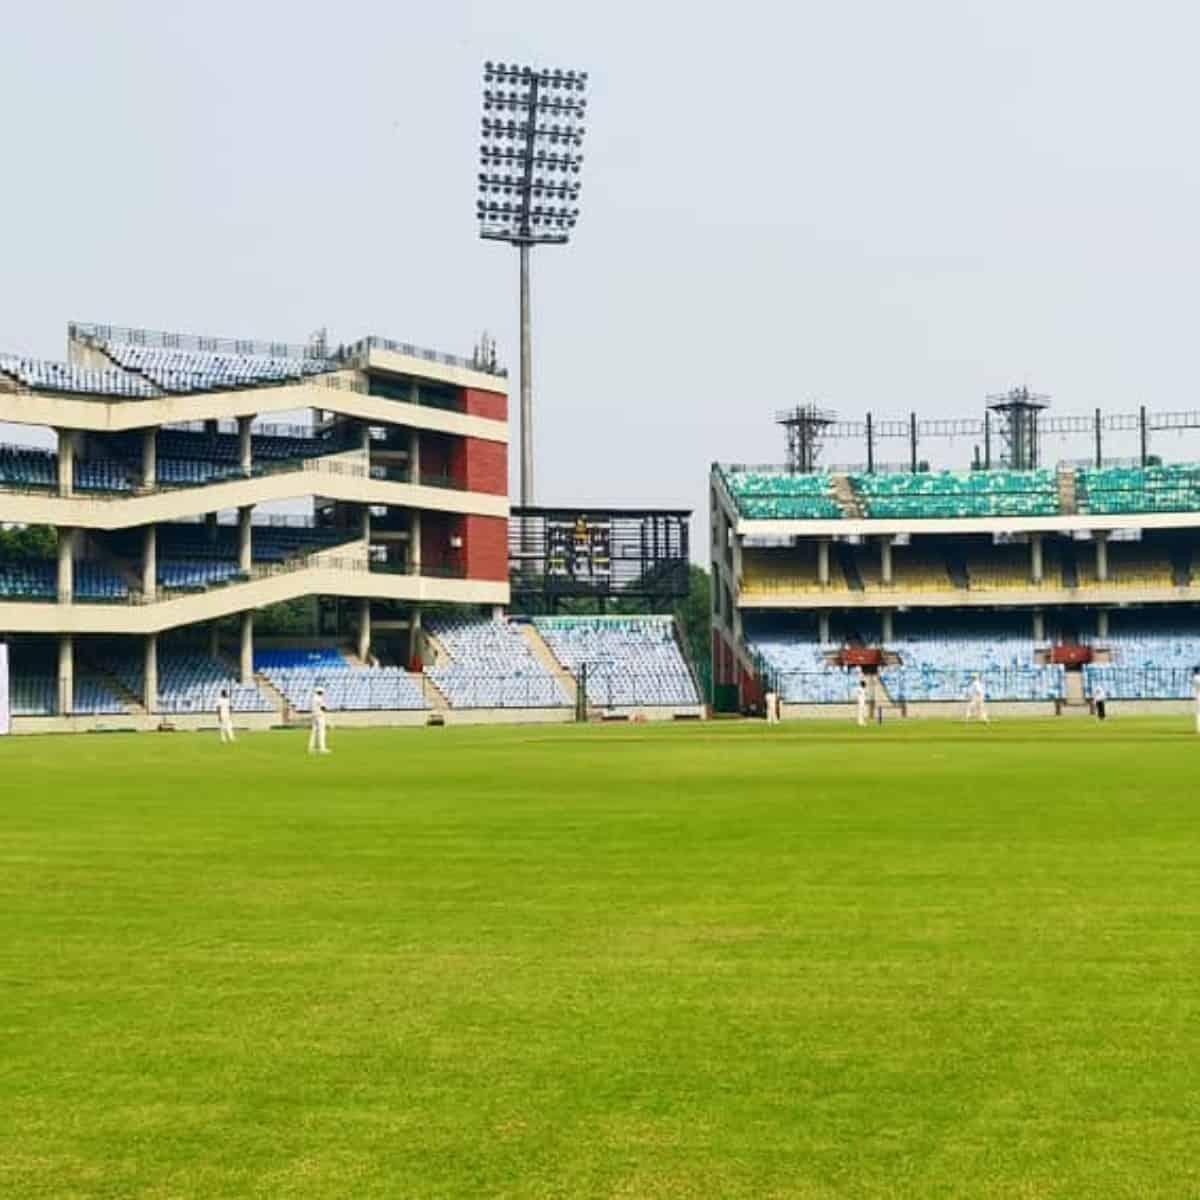 Arun Jaitley Stadium(Feroz Shah Kotla) - New Delhi